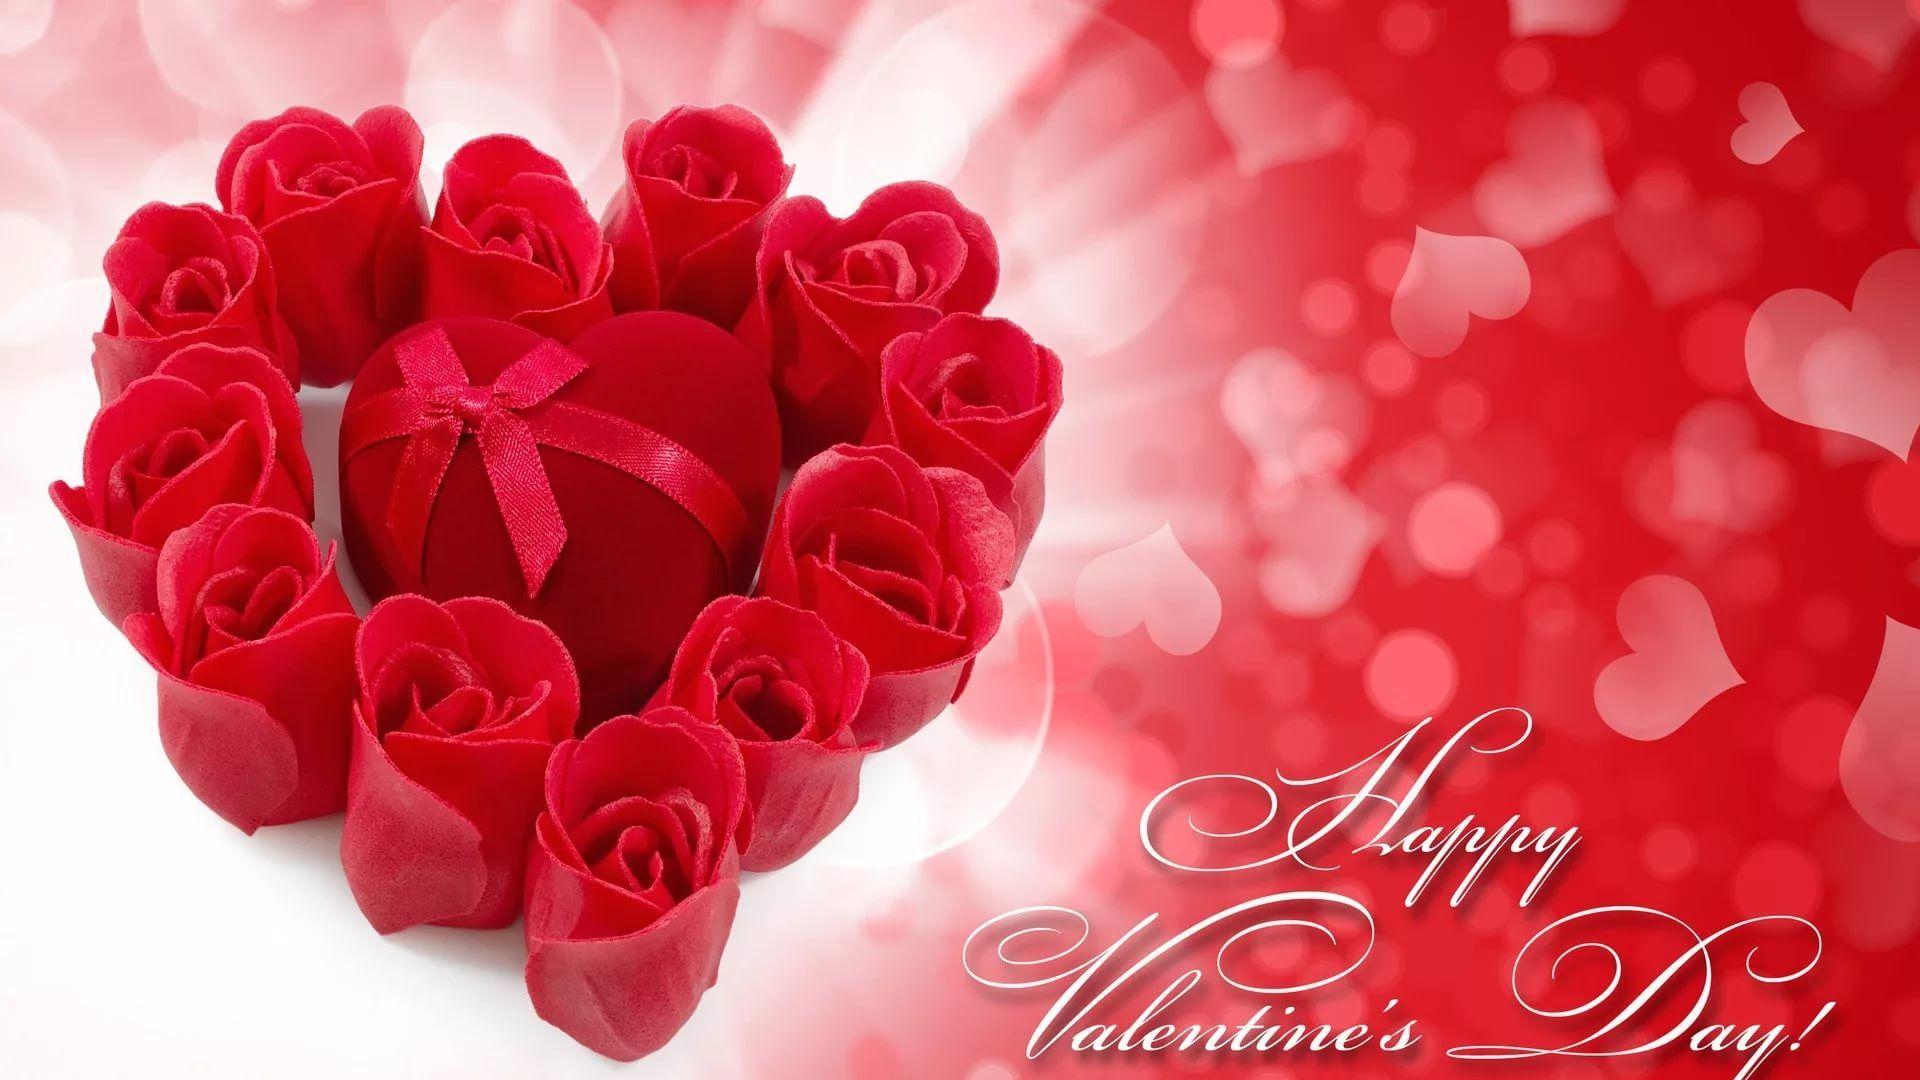 Valentine Screensaver HD Wallpaper